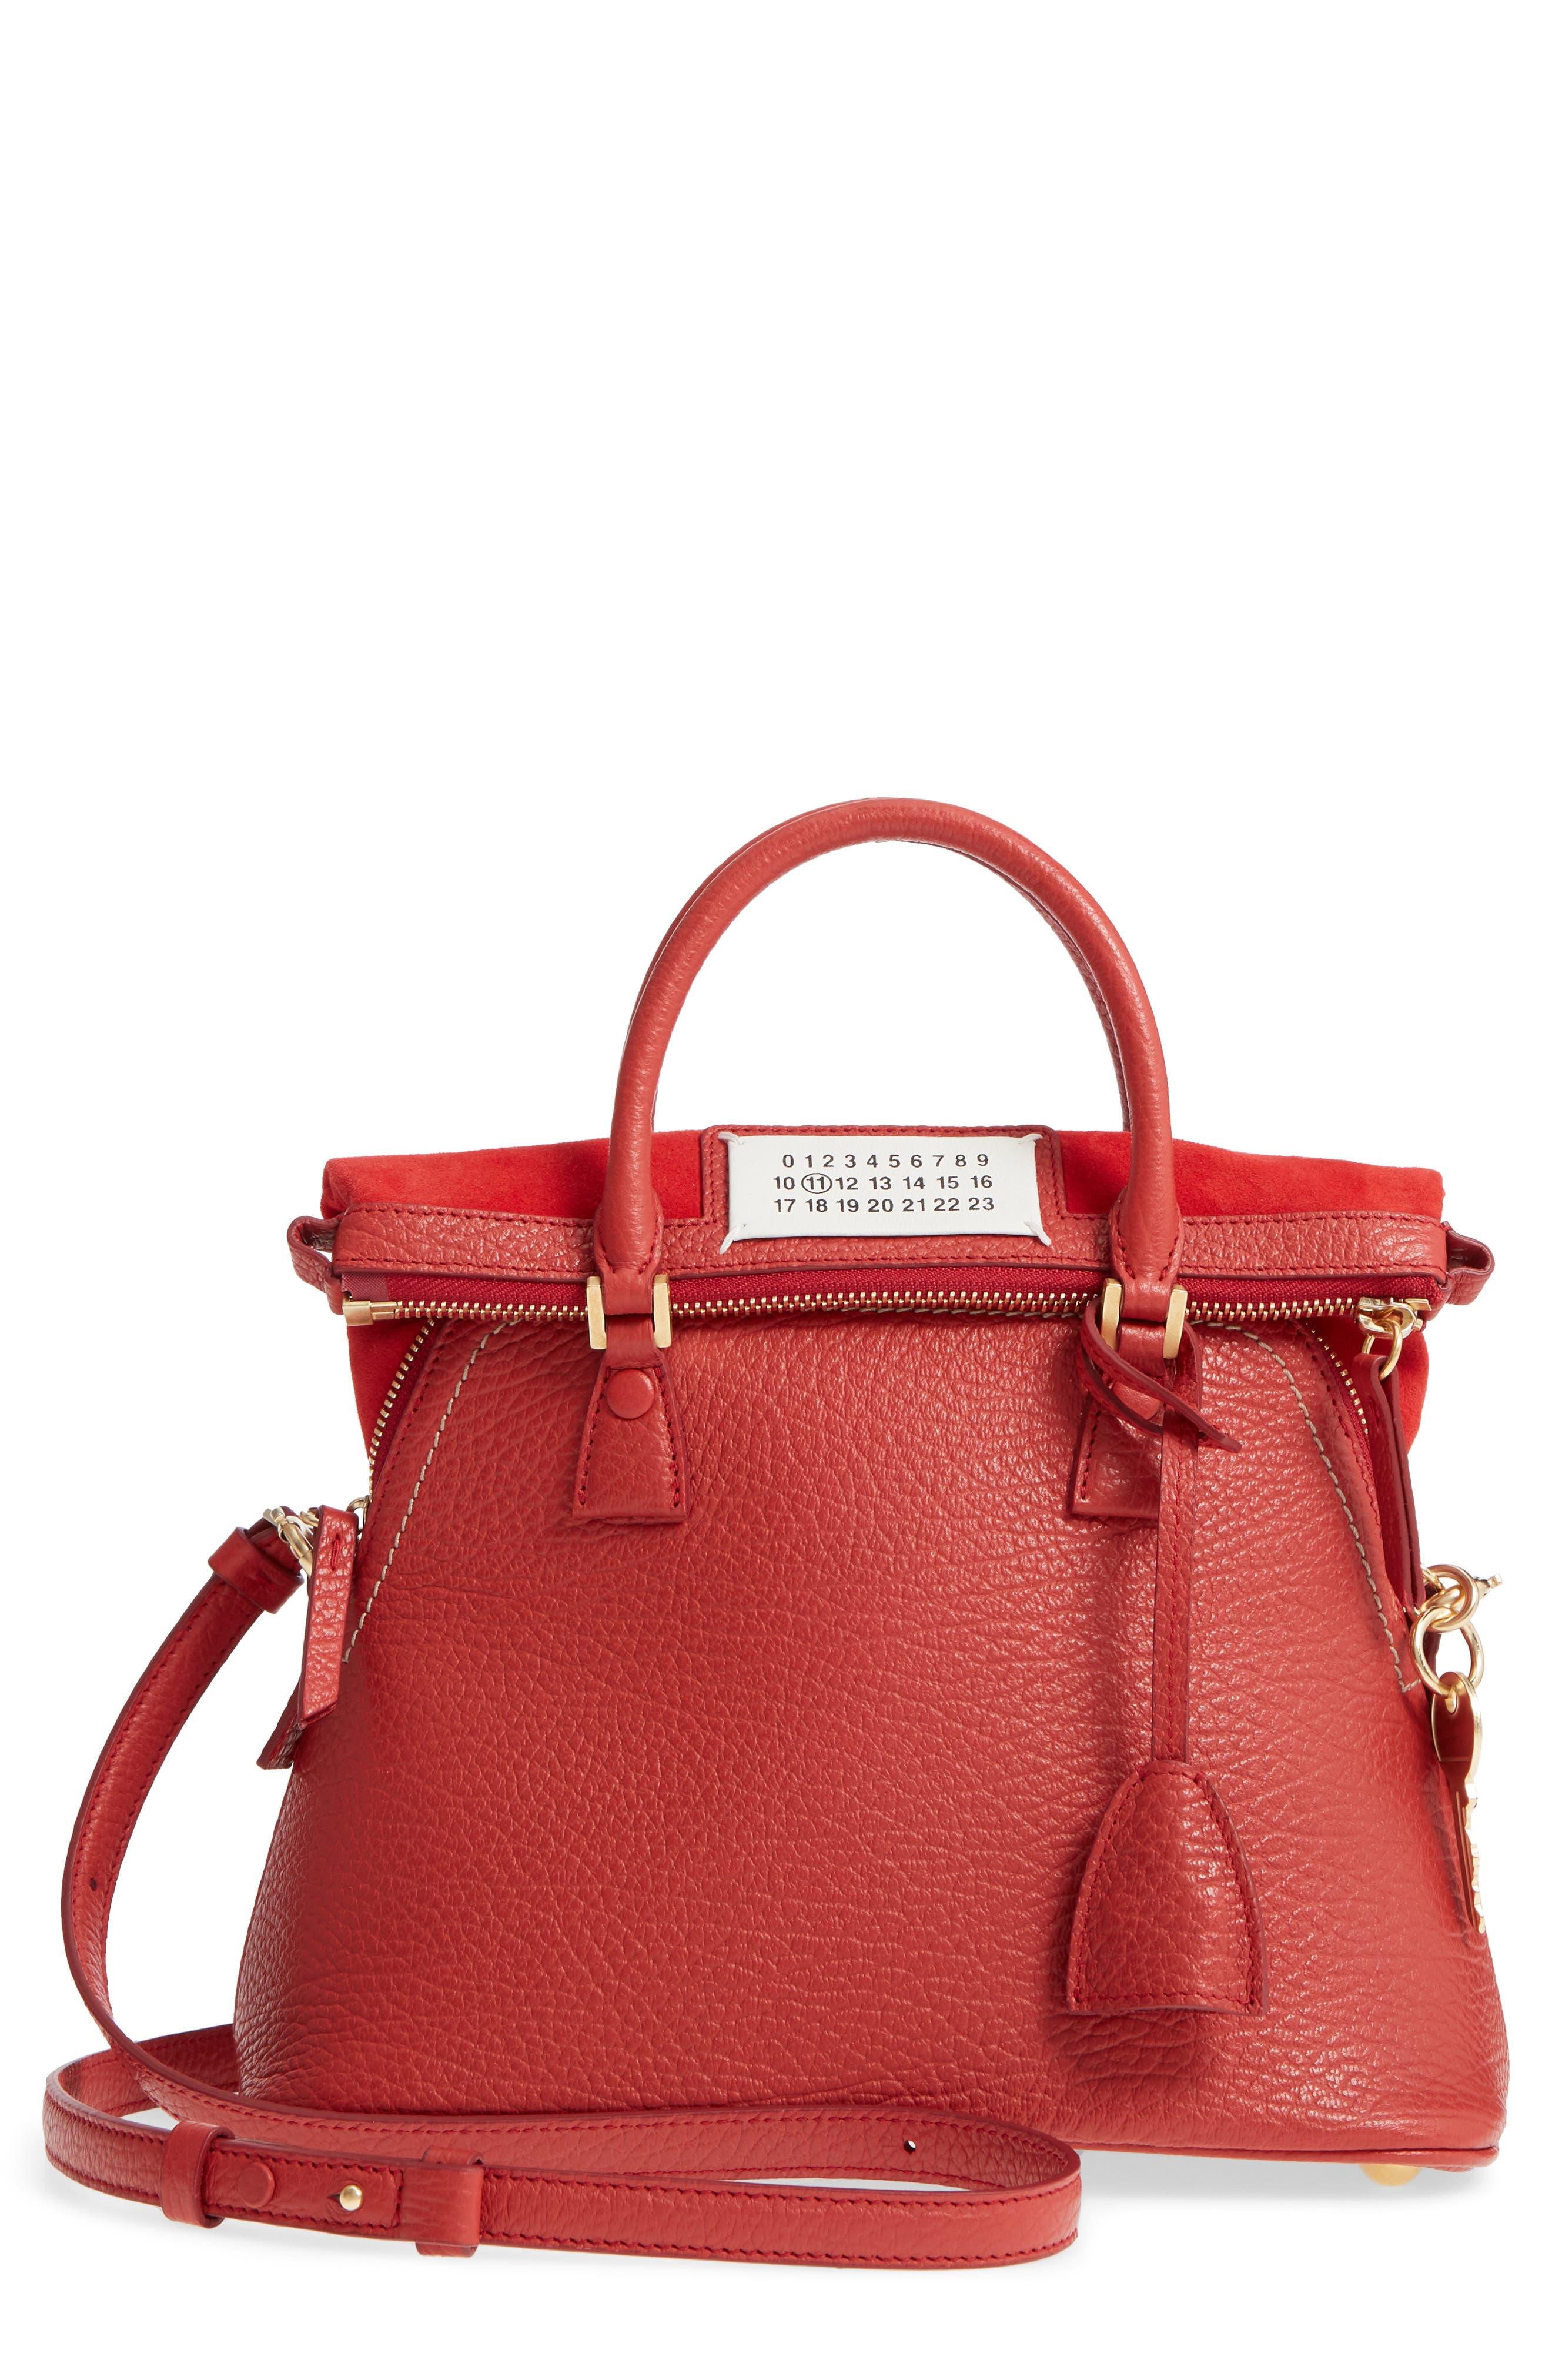 Small 5AC Calfskin Leather Handbag,                         Main,                         color, 600